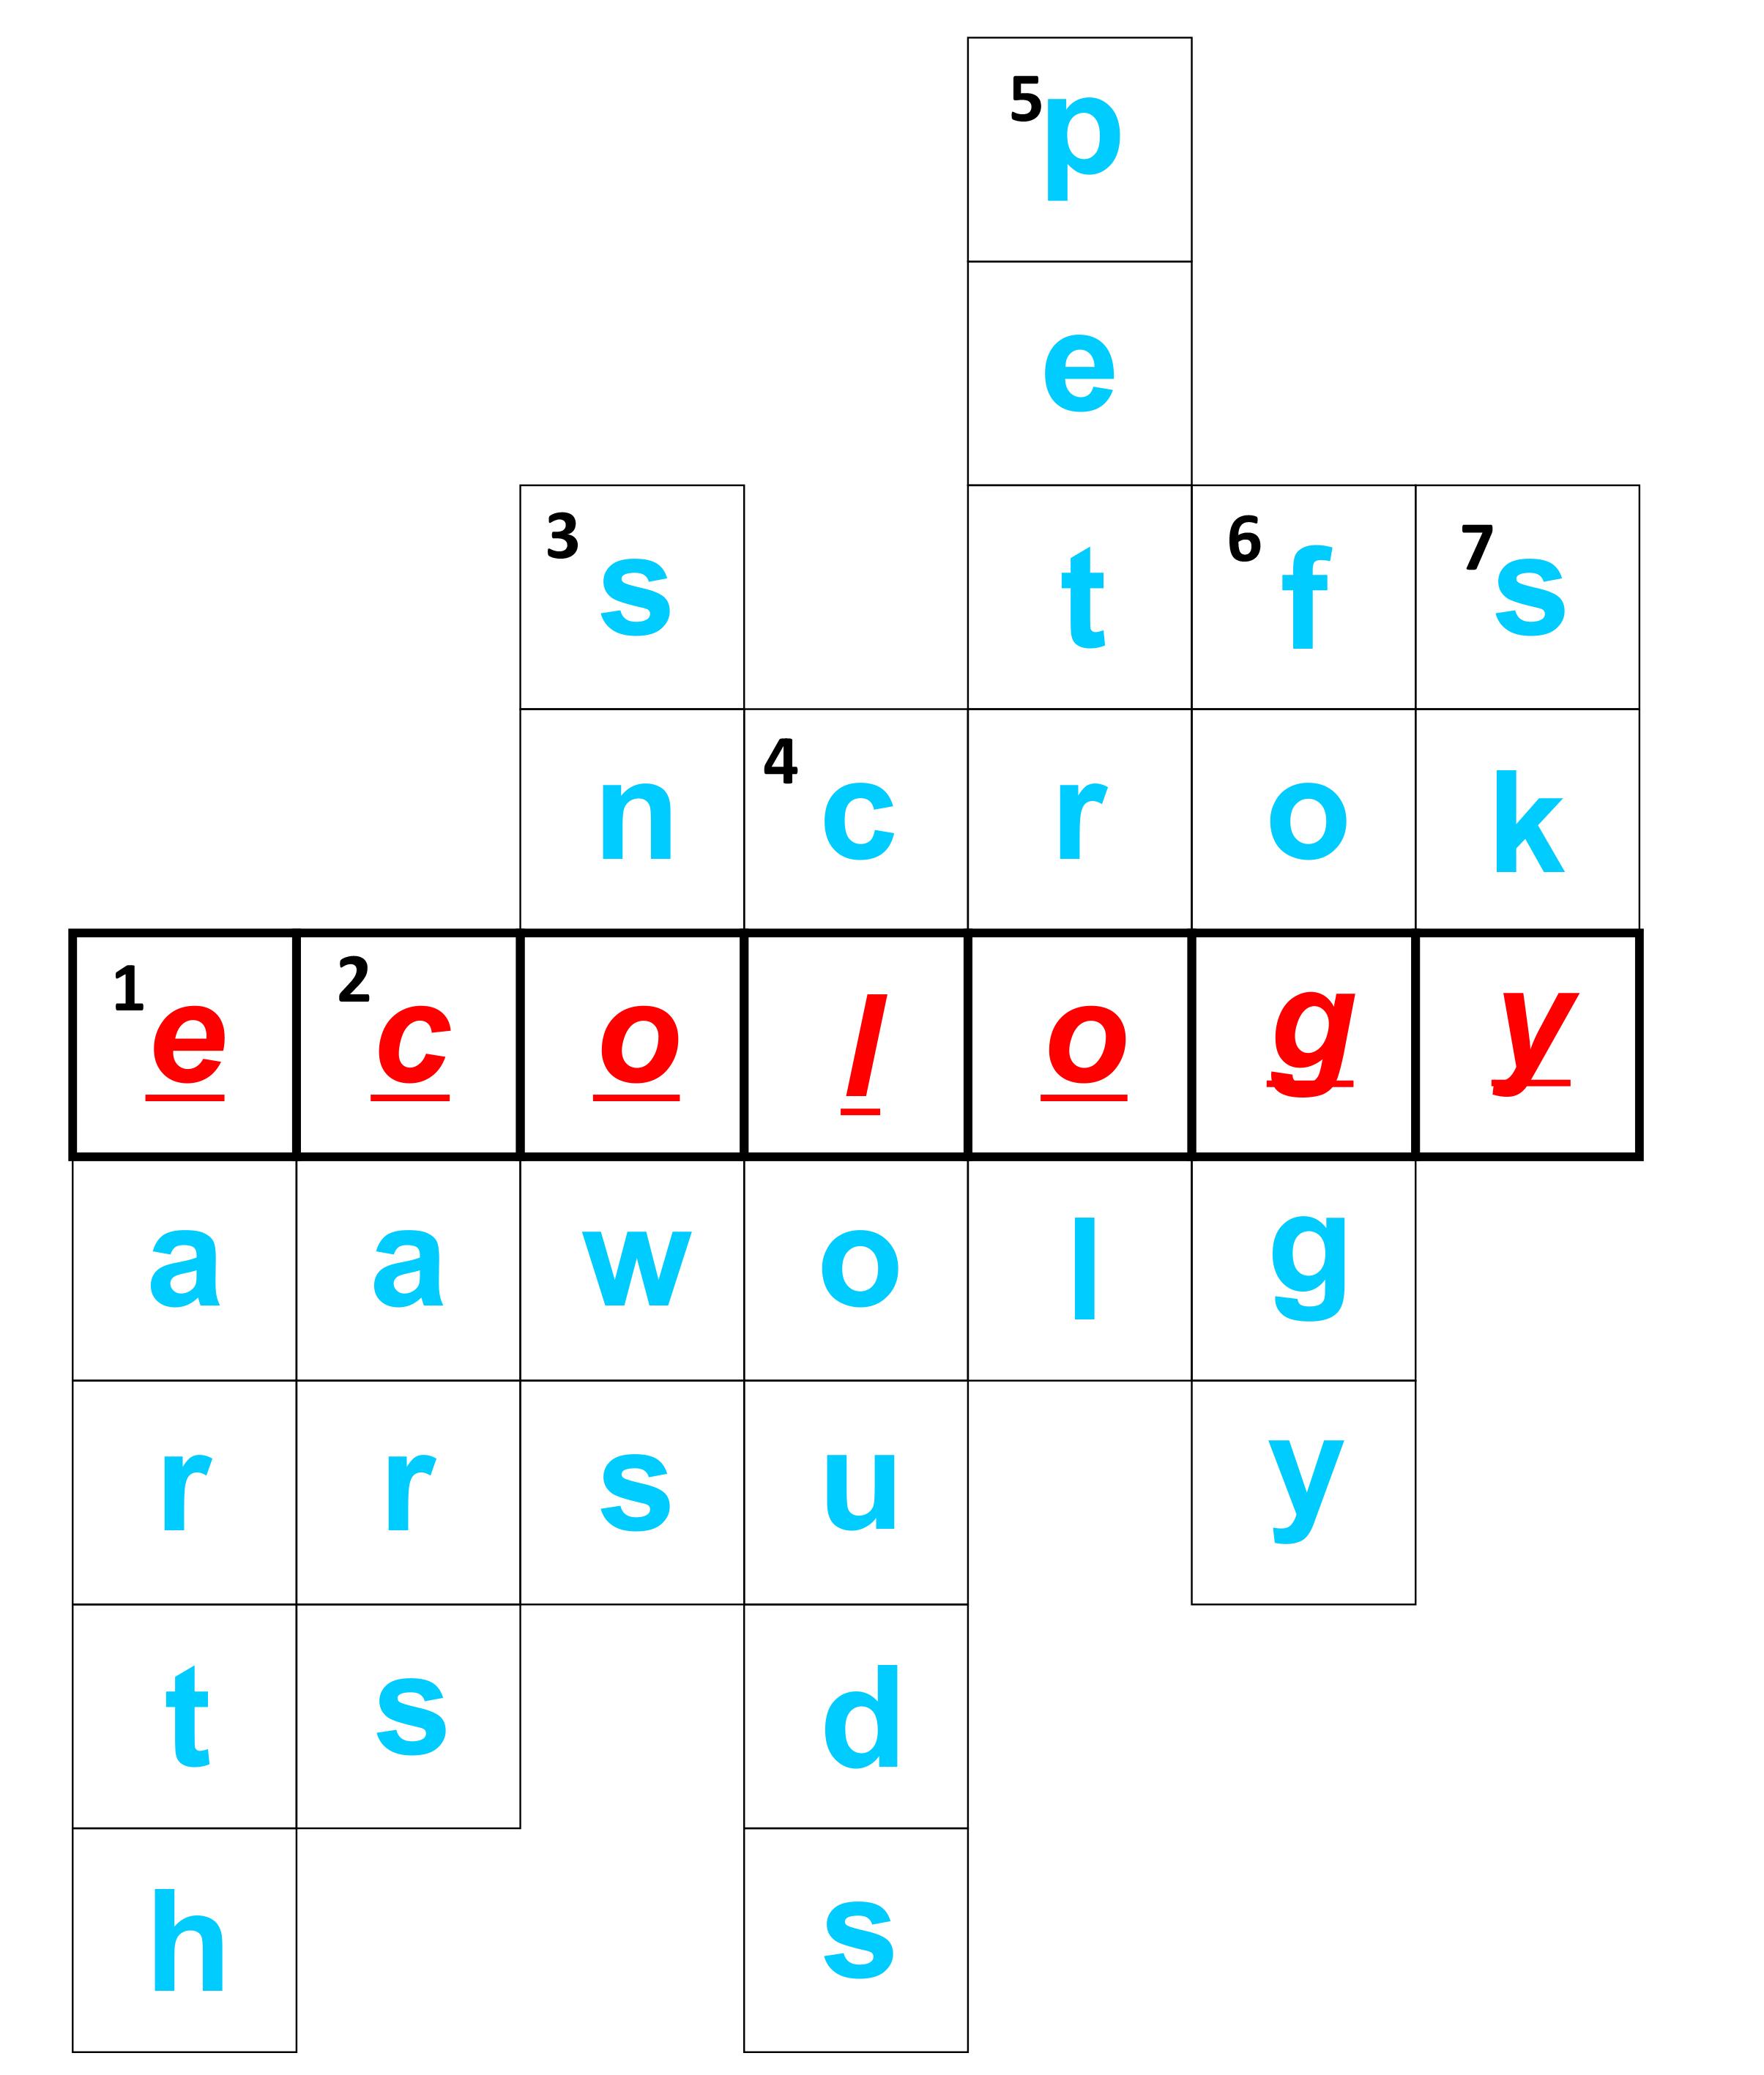 C:\Documents and Settings\Admin\Рабочий стол\кроссворд Ecology.jpg